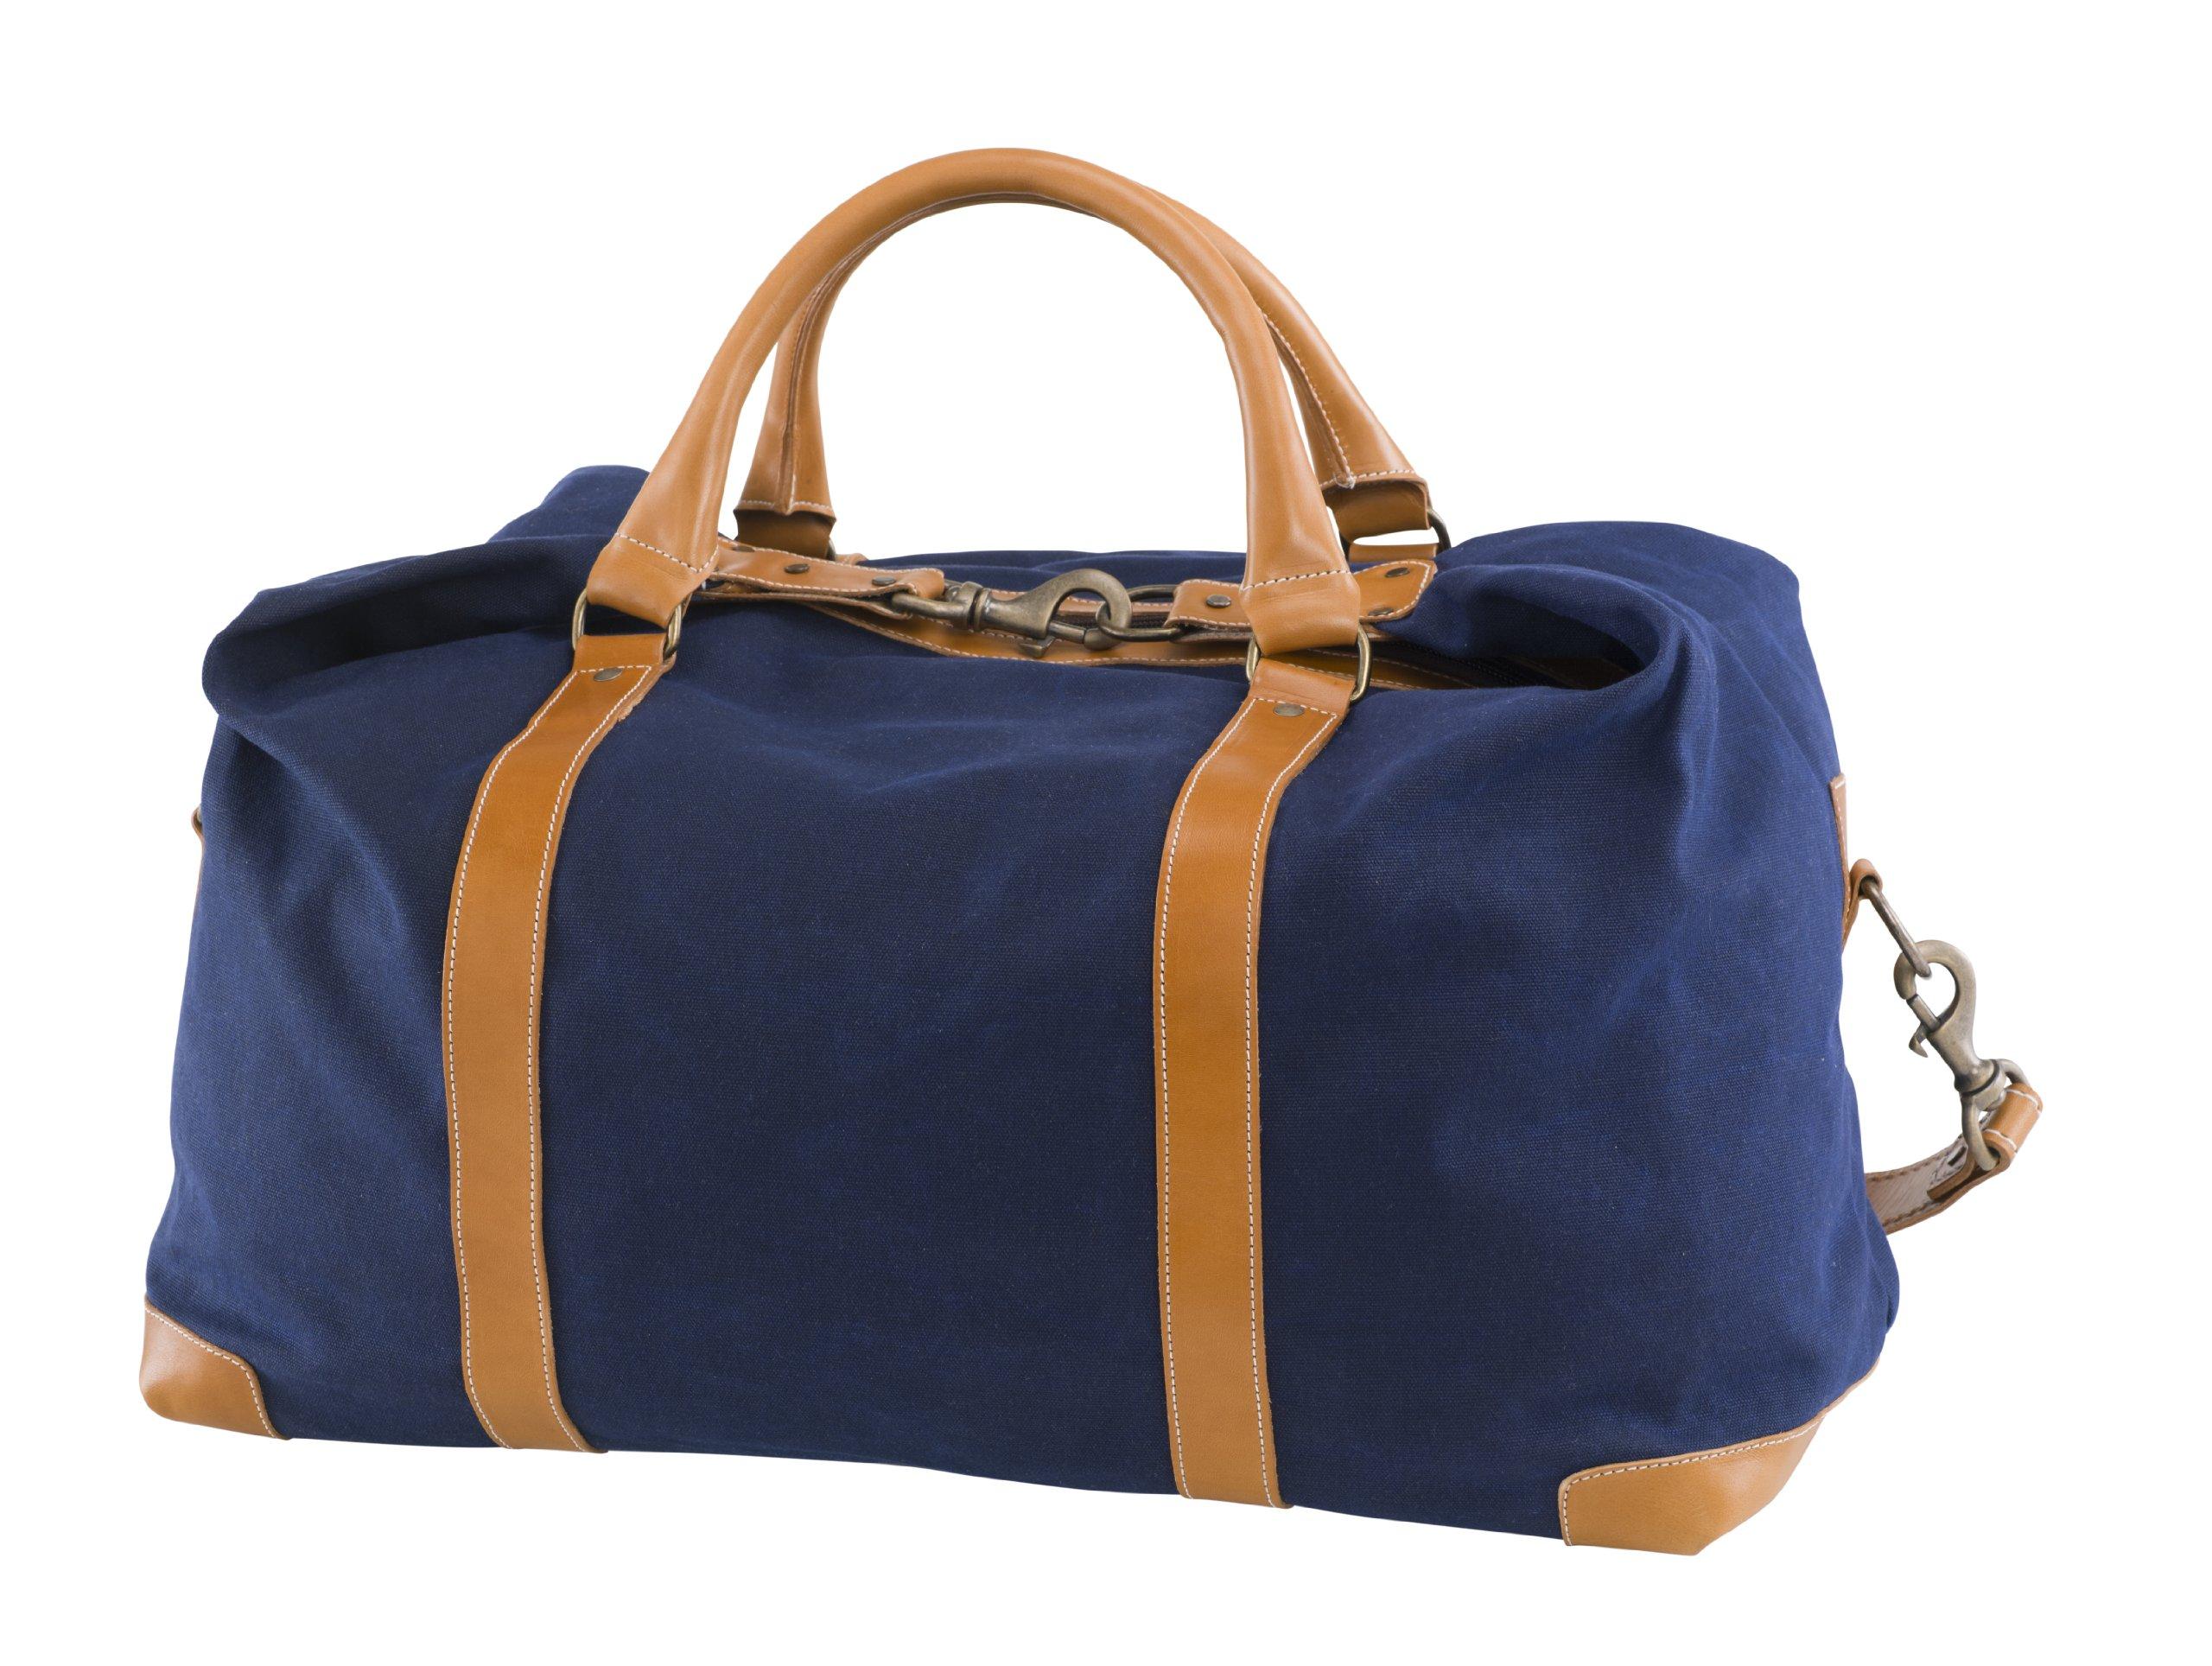 BELDING American Collection Satchel Duffle Bag, Navy by BELDING (Image #2)